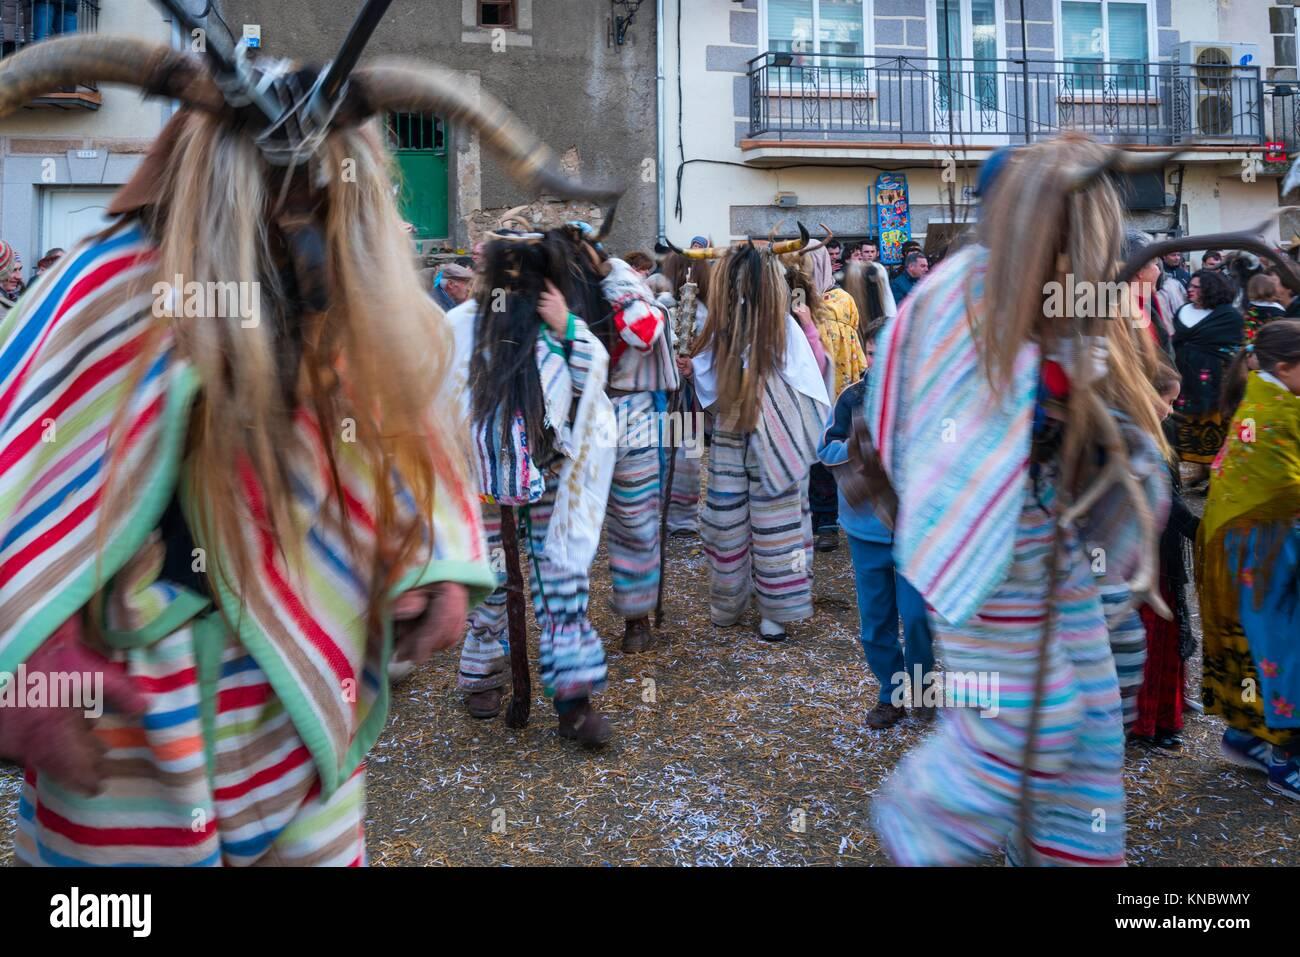 'Los Cucurrumachos'', scary looking evil carnival characters Navalosa, Avila Province, Castile-León, - Stock Image